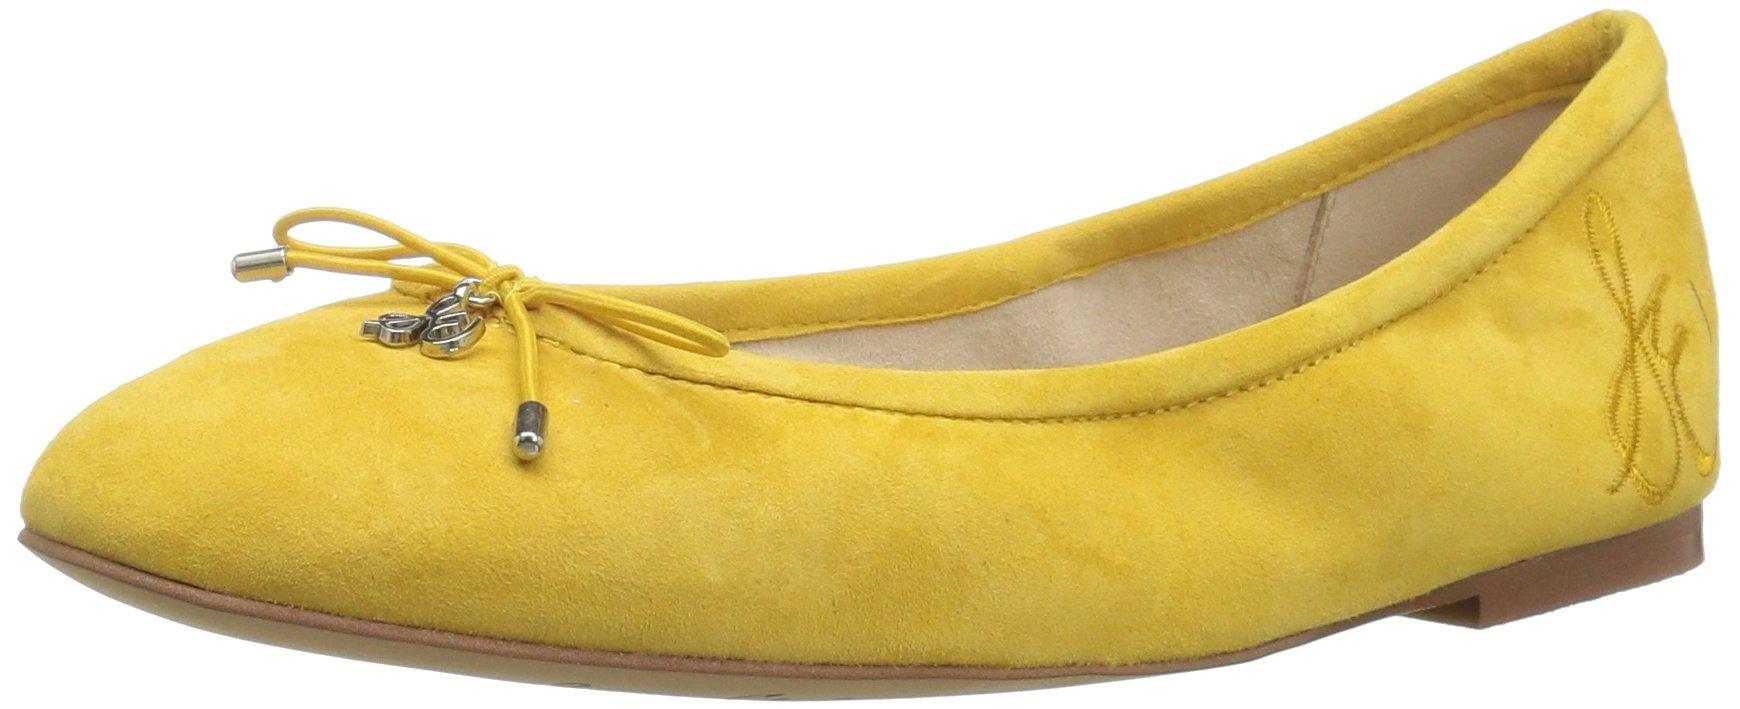 Sam Edelman Women's Felicia Ballet Flat, Sunset Yellow Suede, 5.5 M US